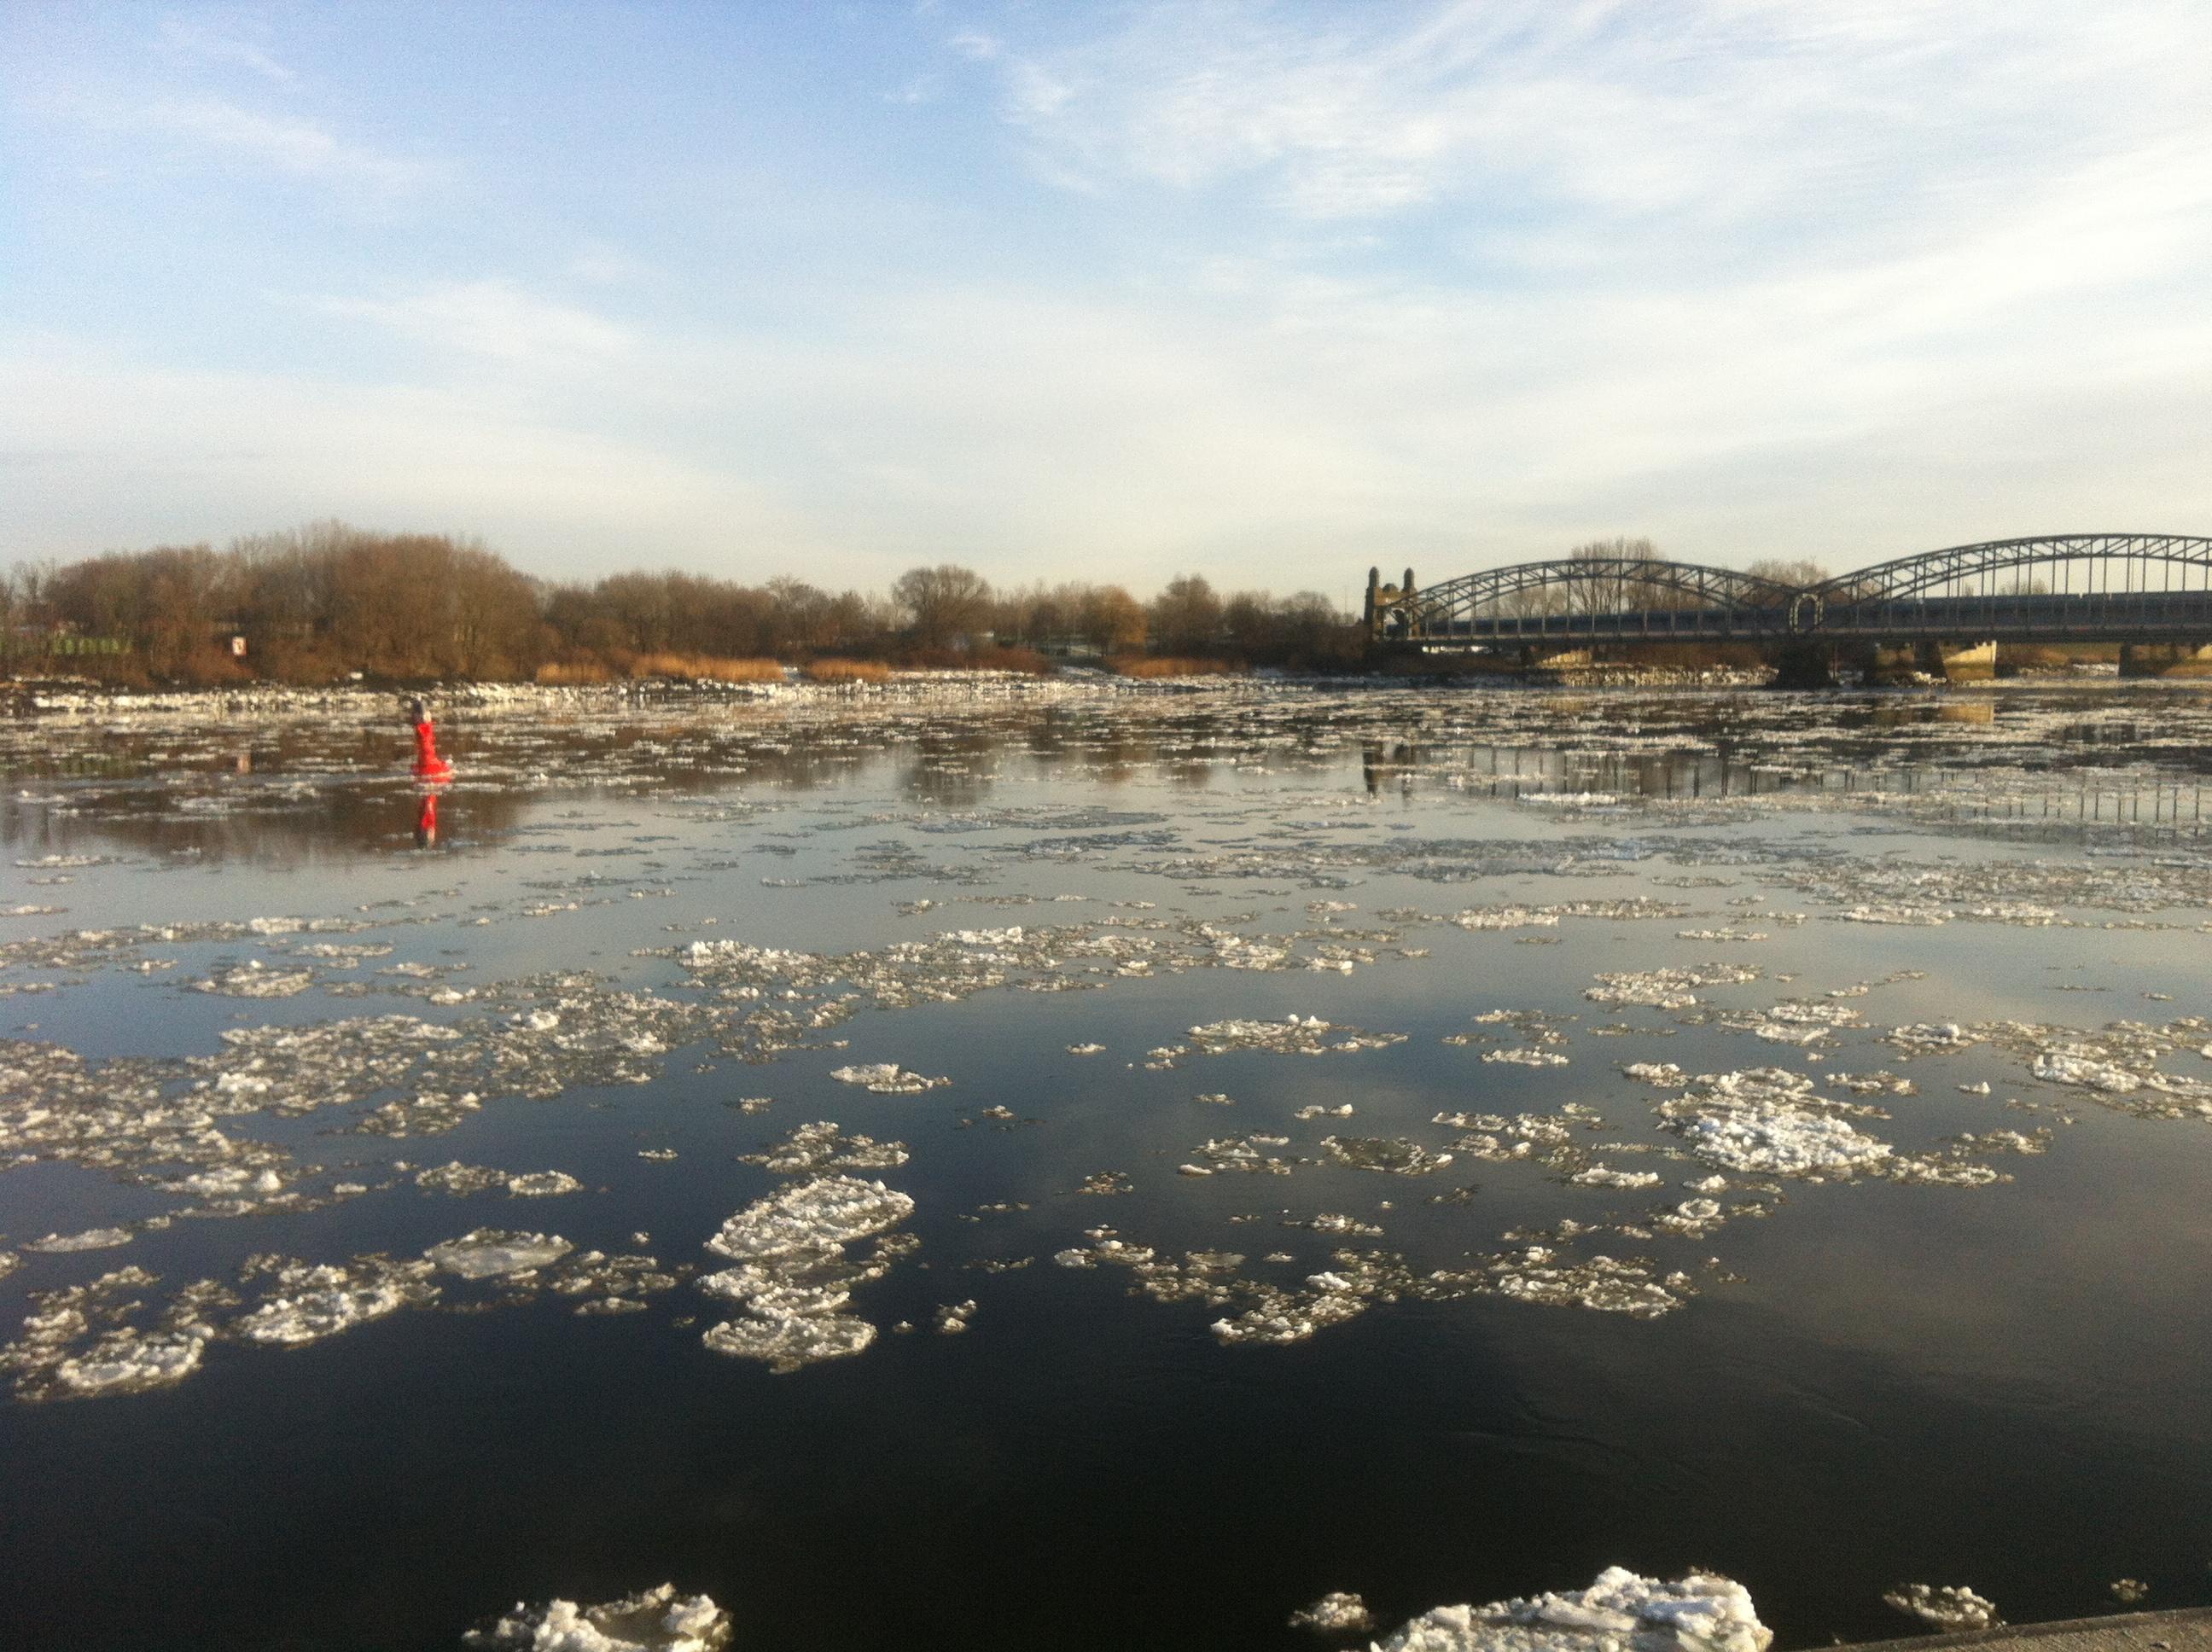 Ice on Elbe river in Hamburg. By Mirjam S. Glessmer